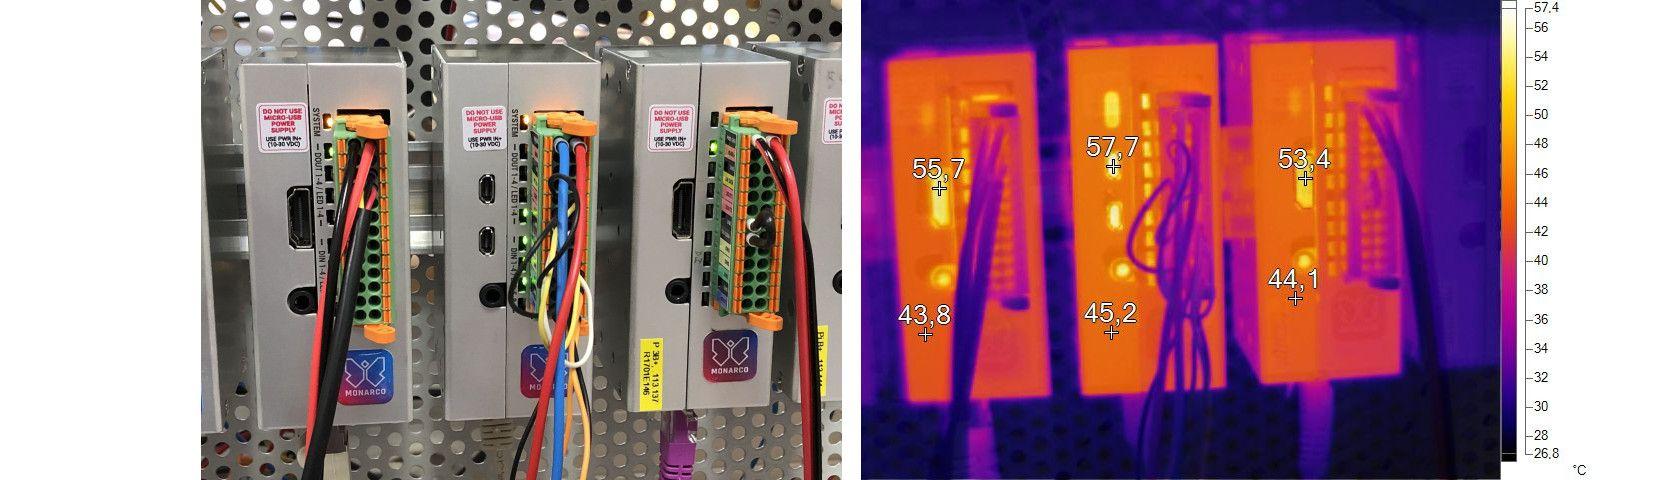 Infrared photo of Monarco HAT on aDIN rail, Raspberry Pi 3 and 4